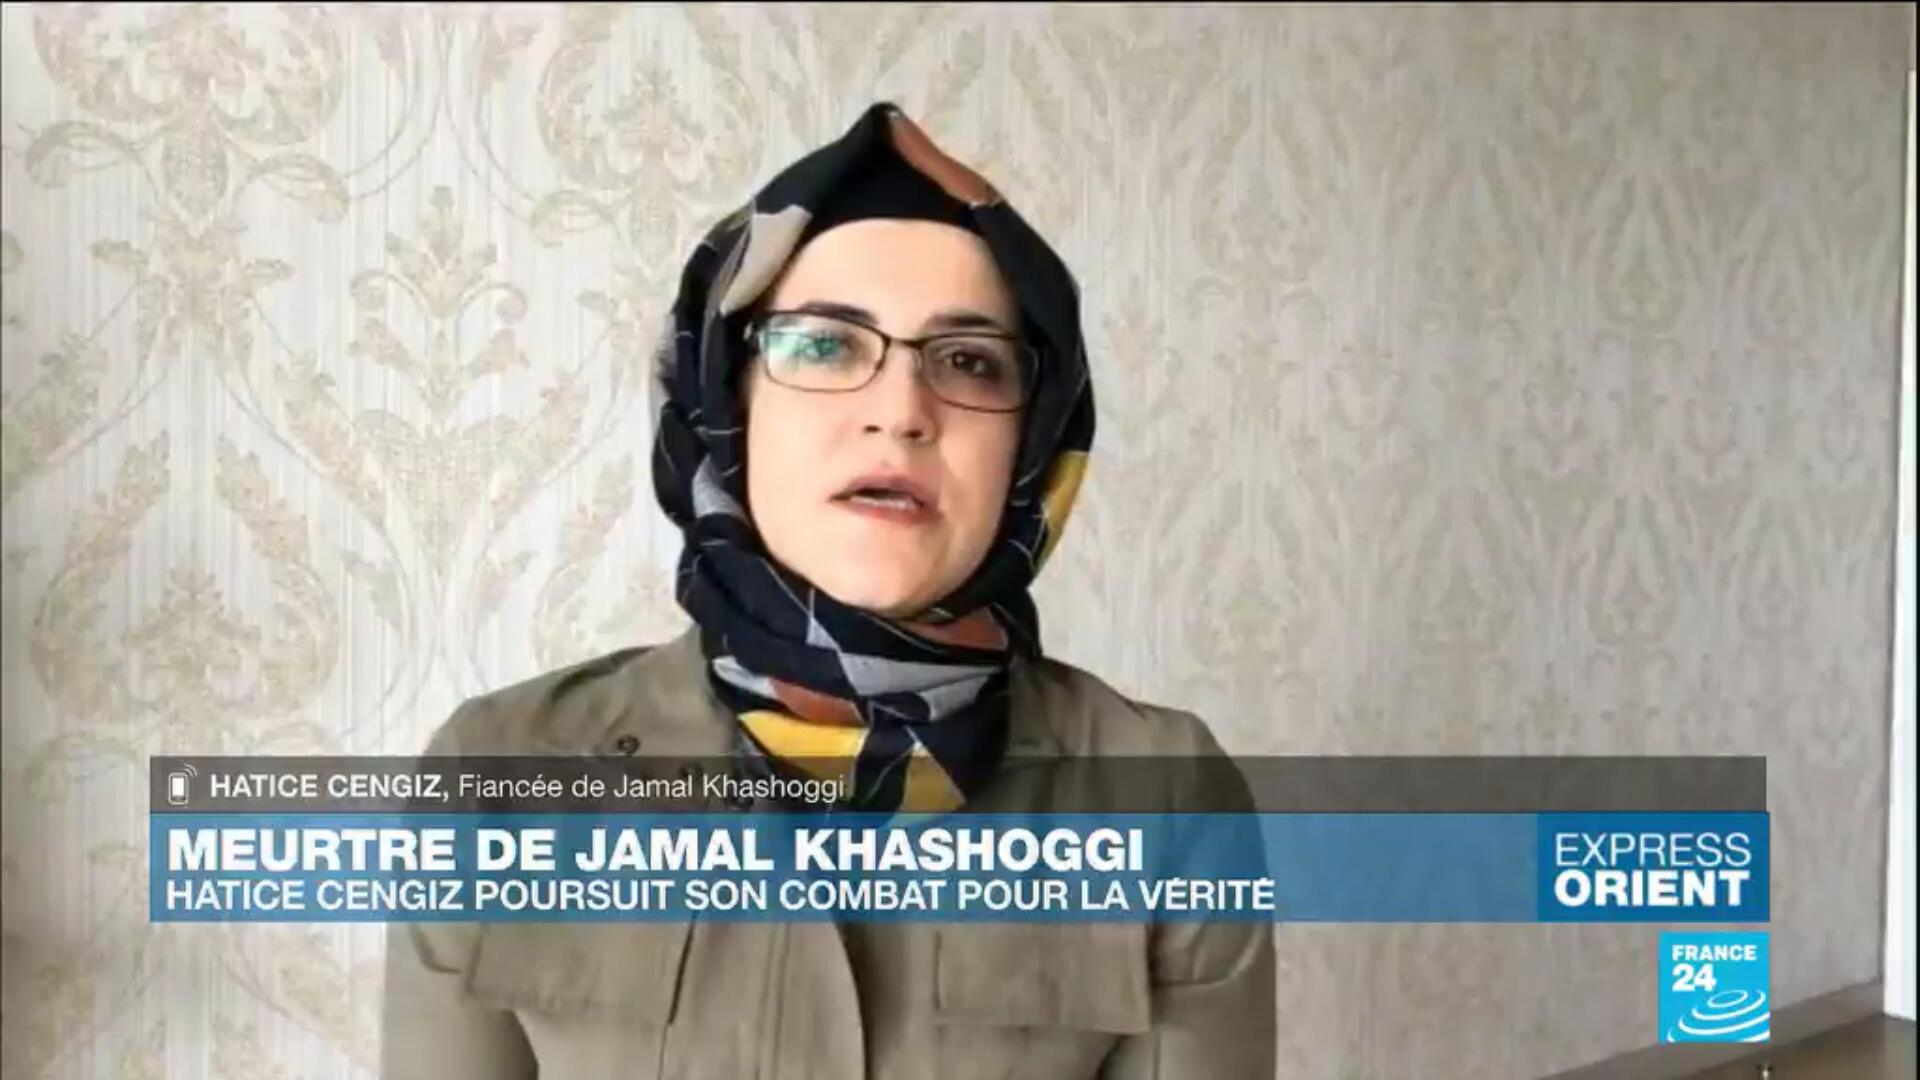 Hatice Cengiz, fiancée du journaliste saoudien Jamal Khashoggi, assassiné en 2018.